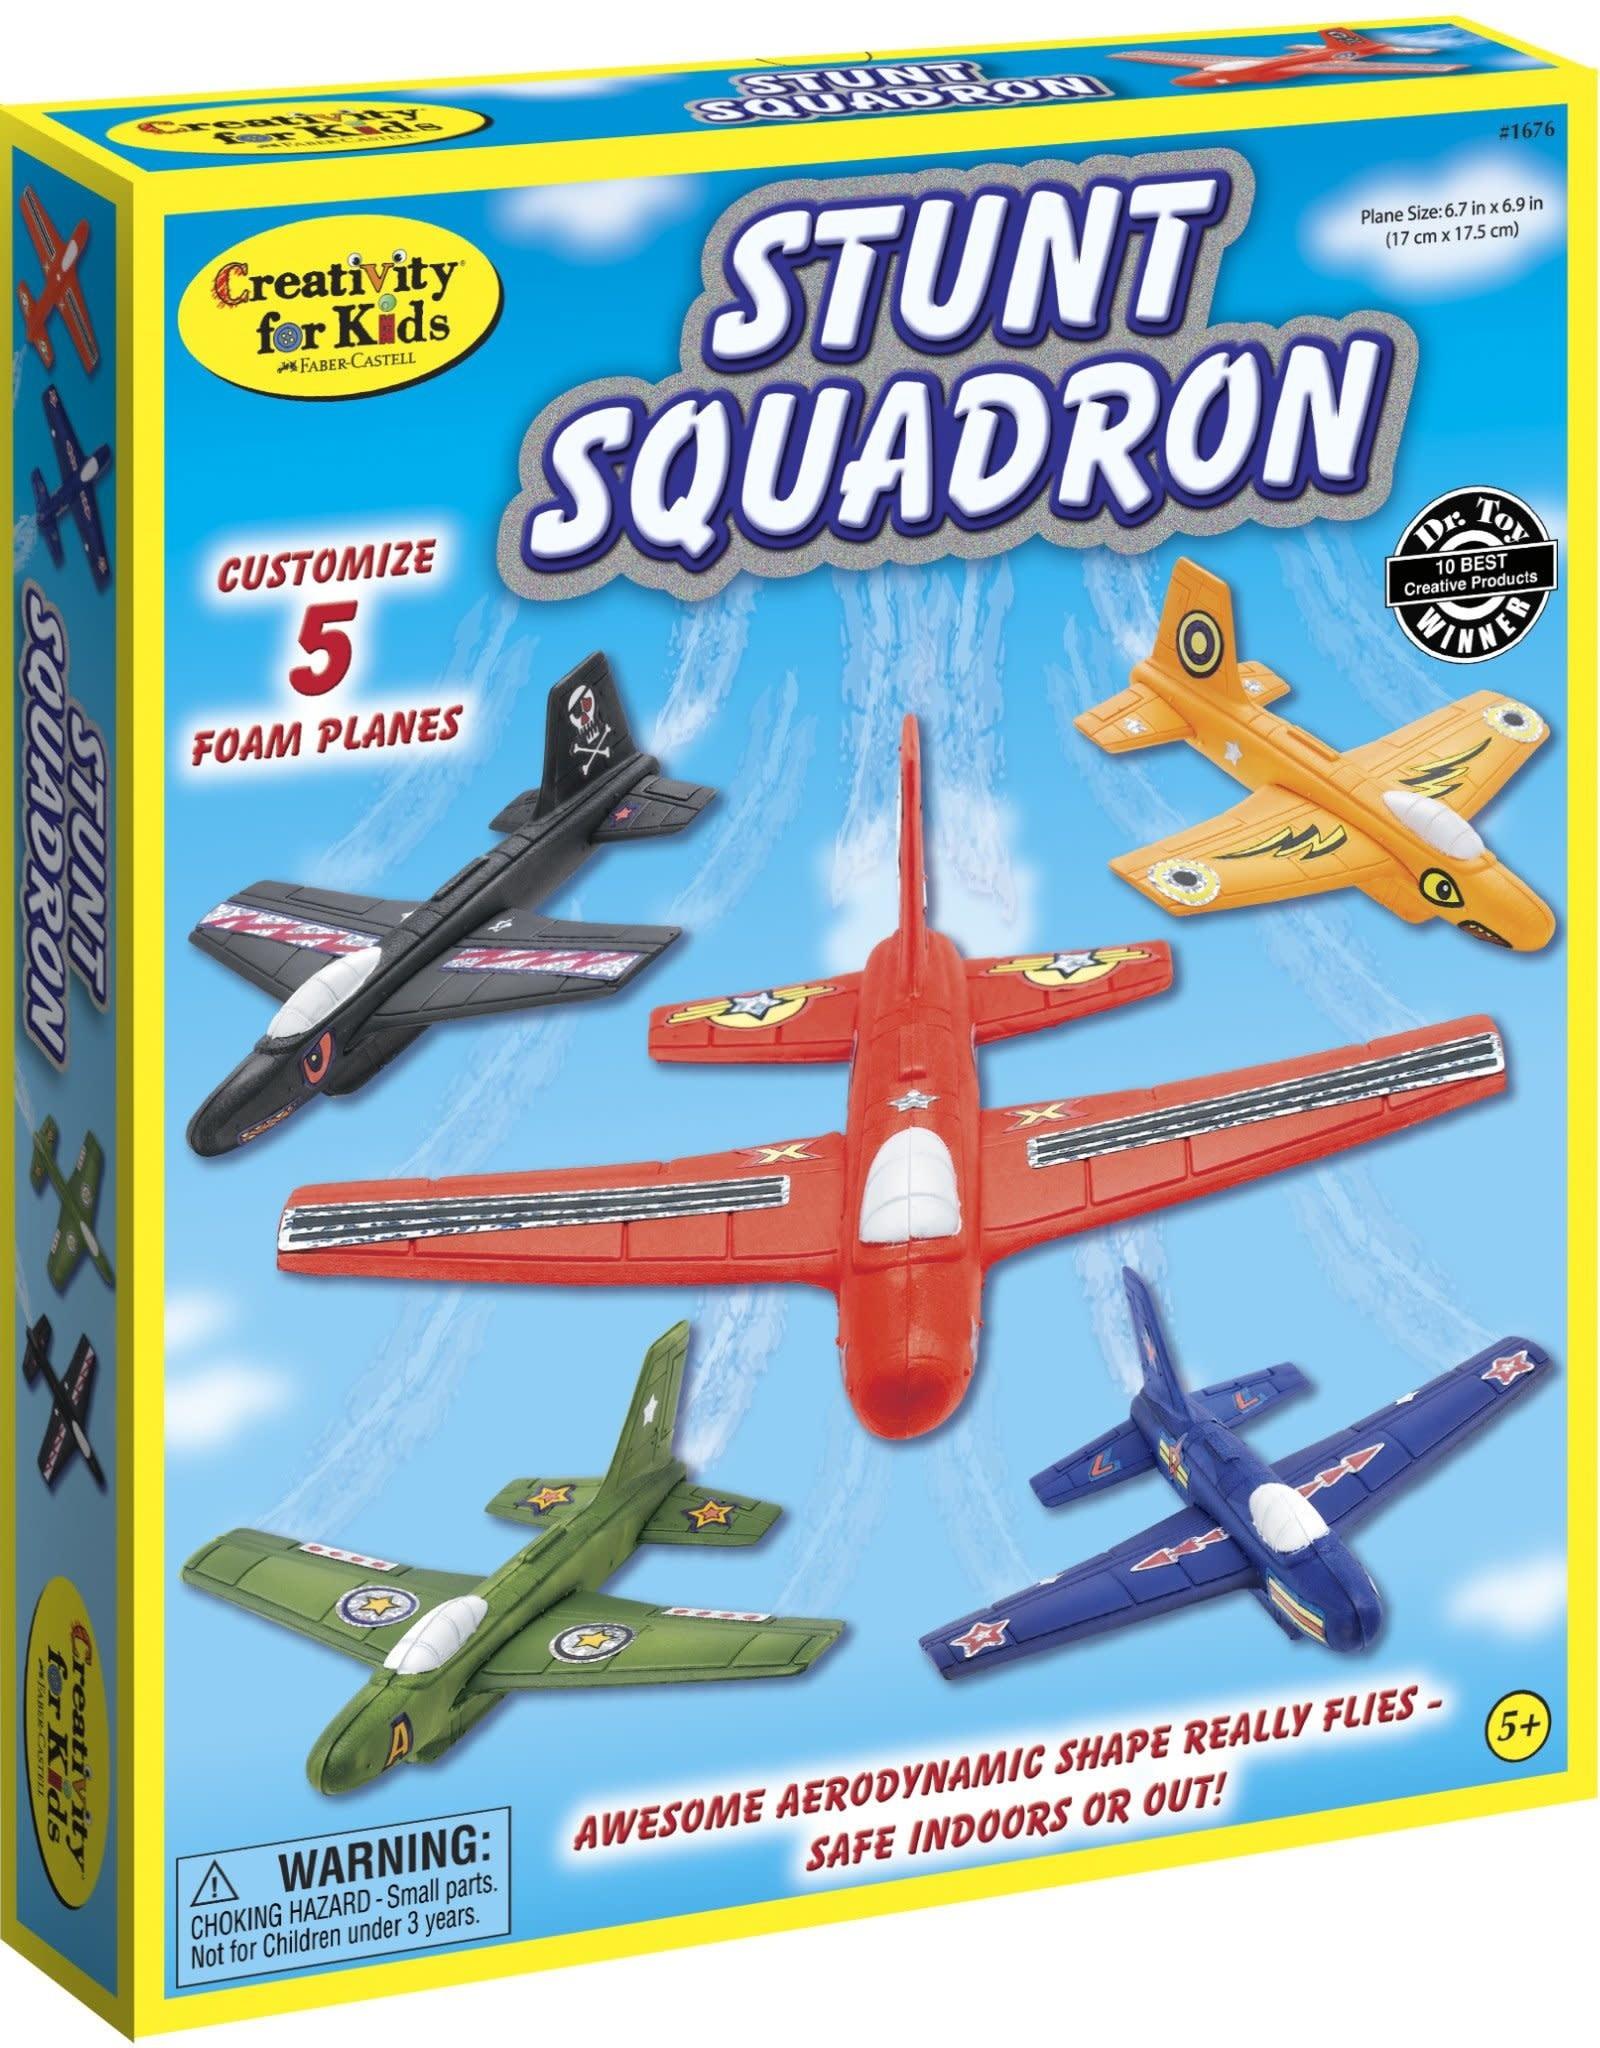 Creativity for Kids Stunt Squadron